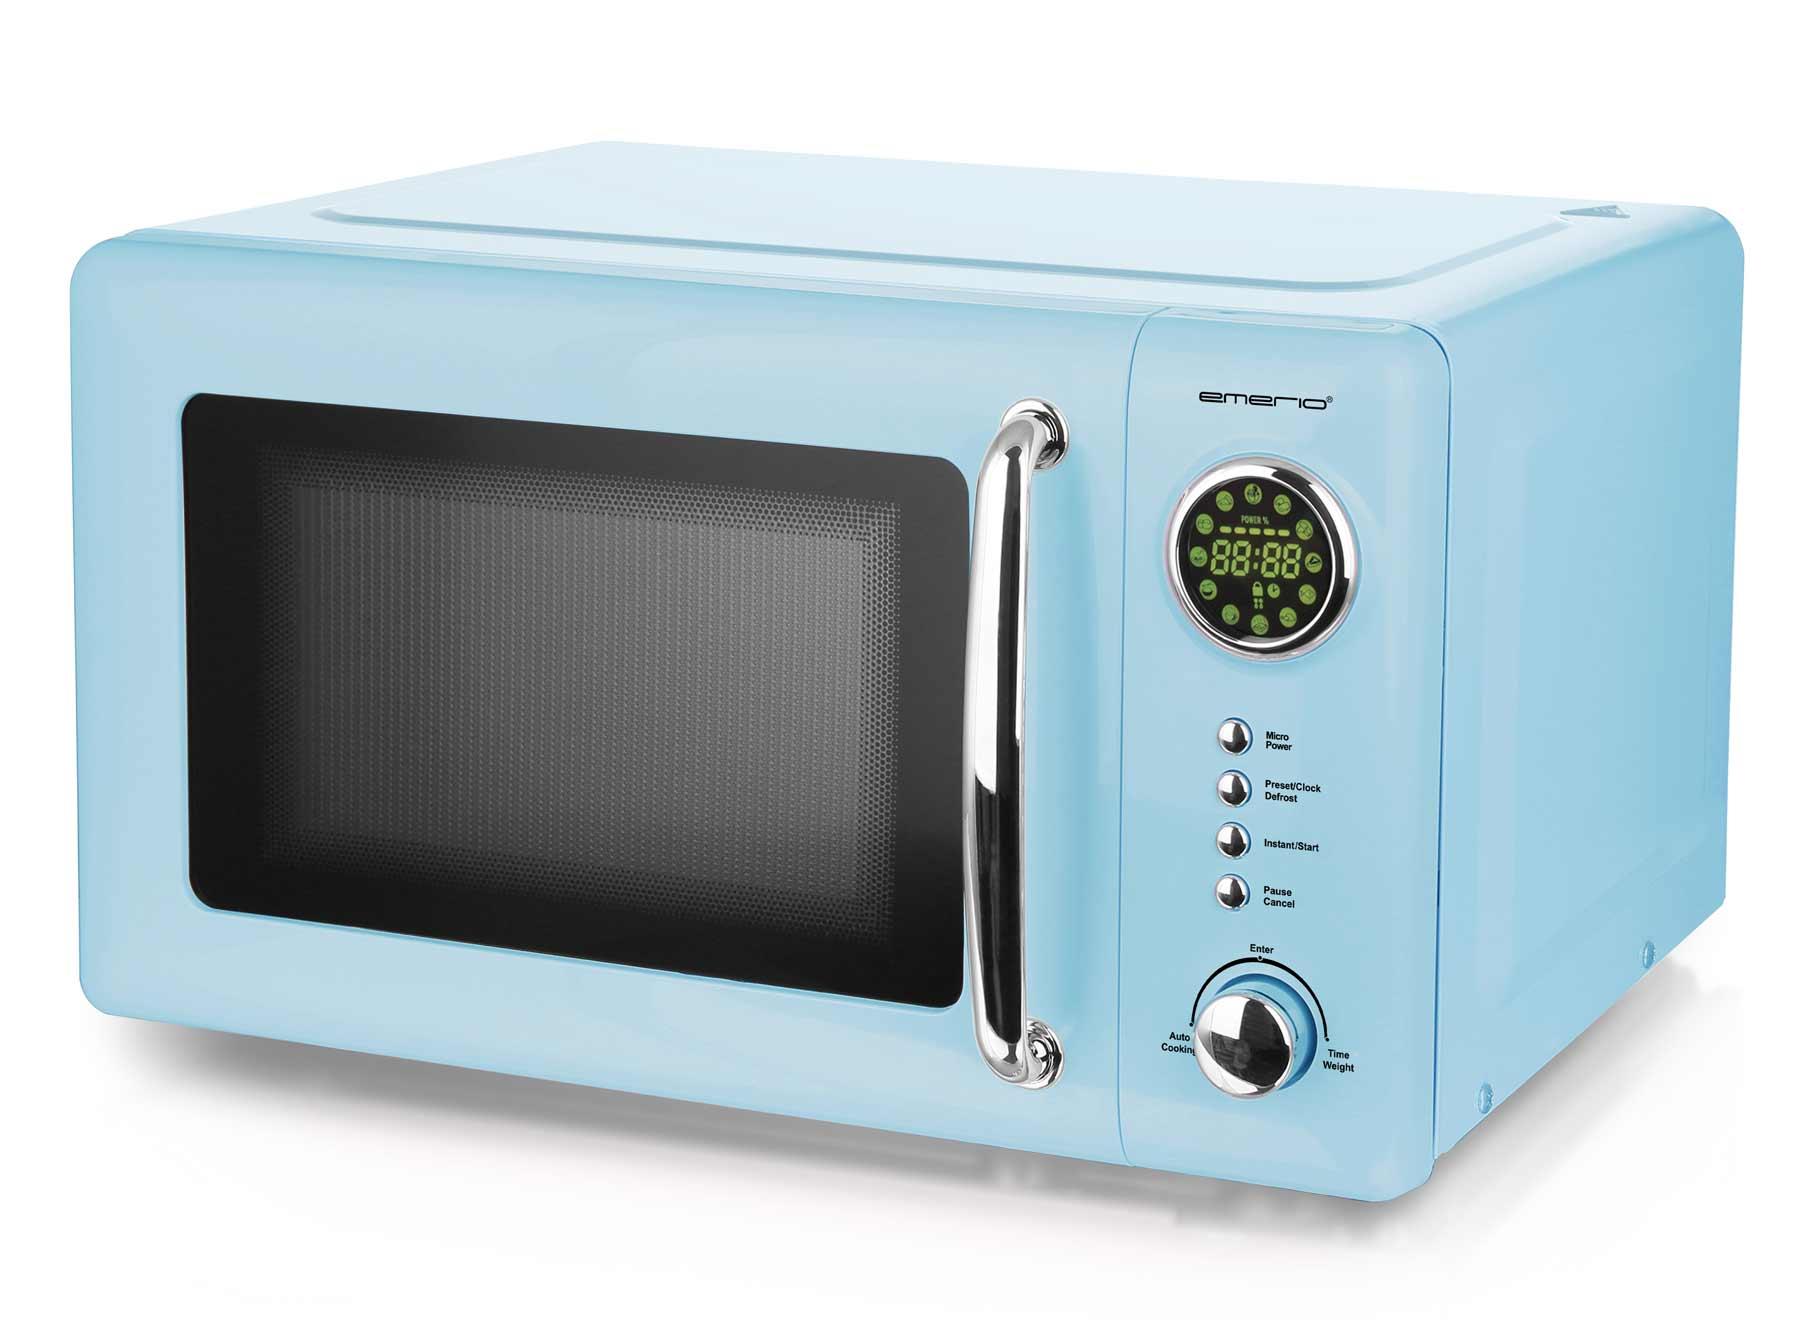 Mikrowelle Retro Design Emerio MW-112141.2 hell-blau / baby-blau – Bild 1